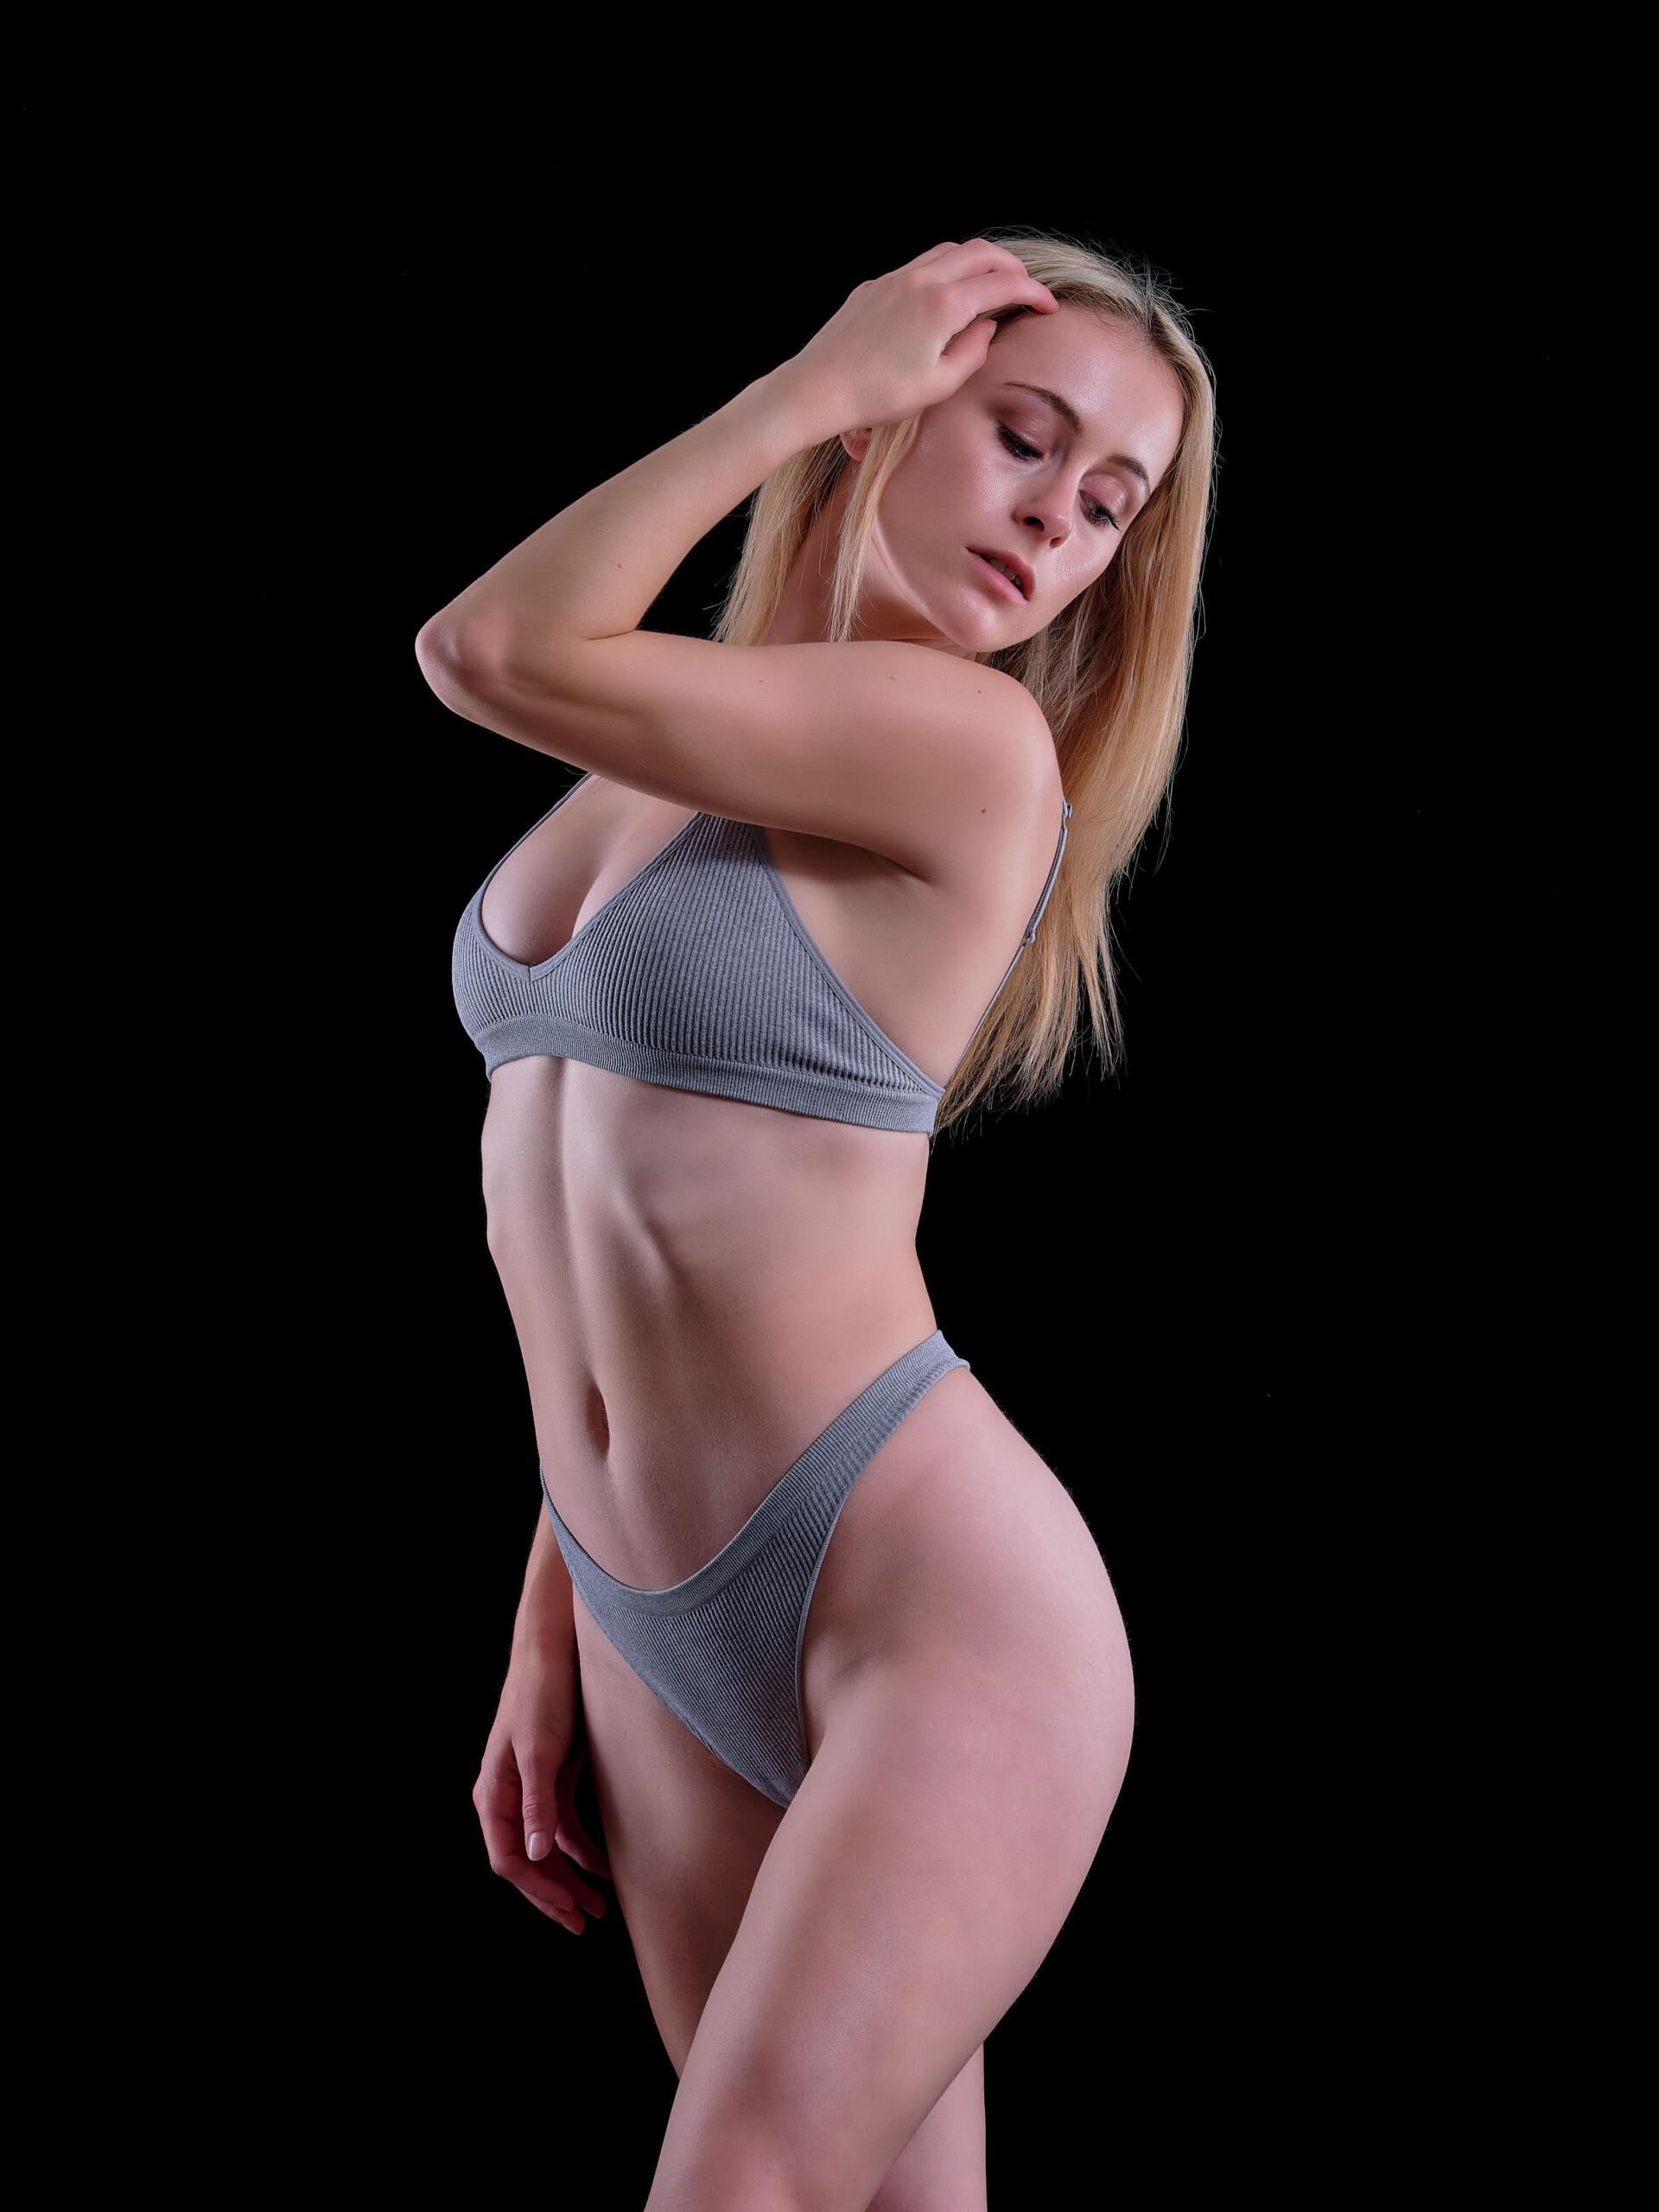 Alyson King 1 Model Portfolio Photography